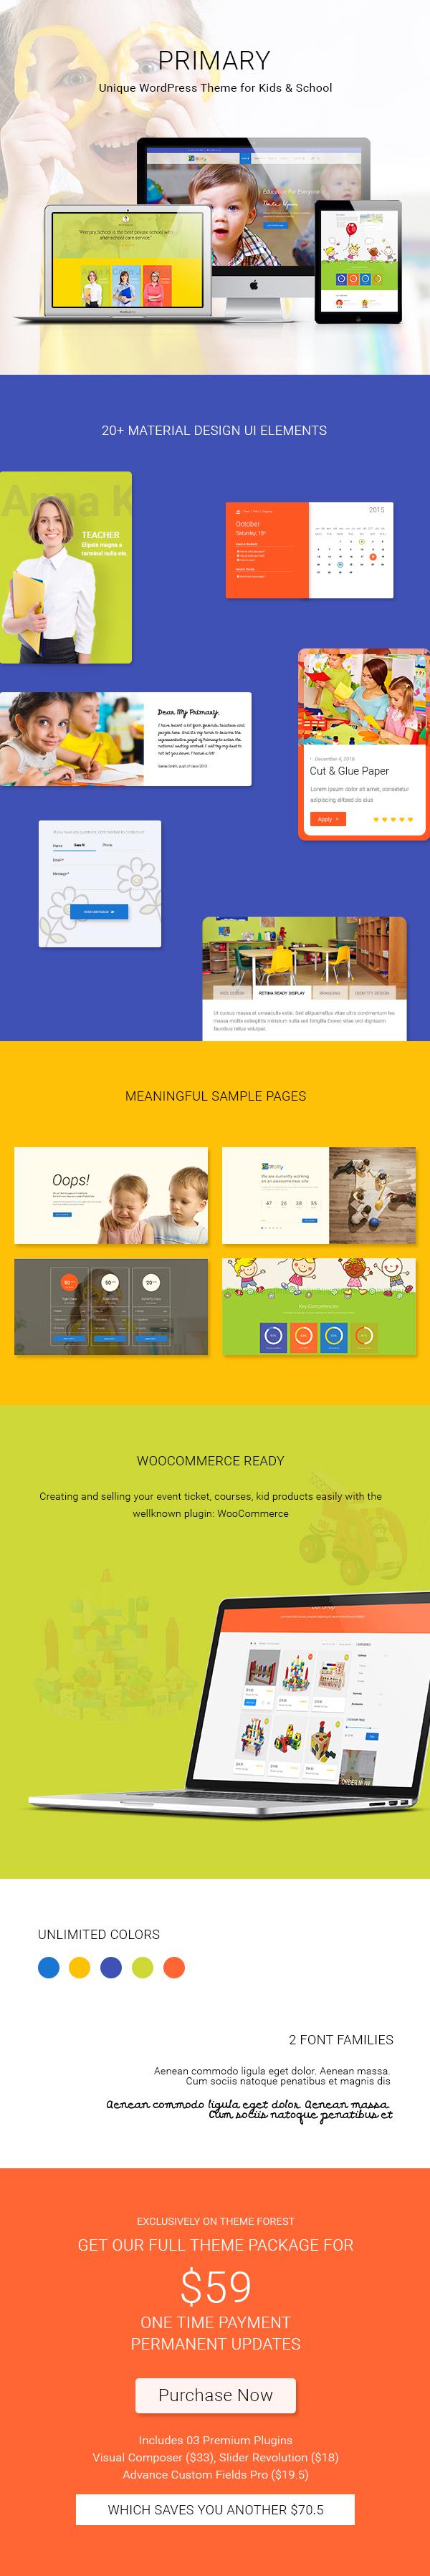 pimary wordpress theme